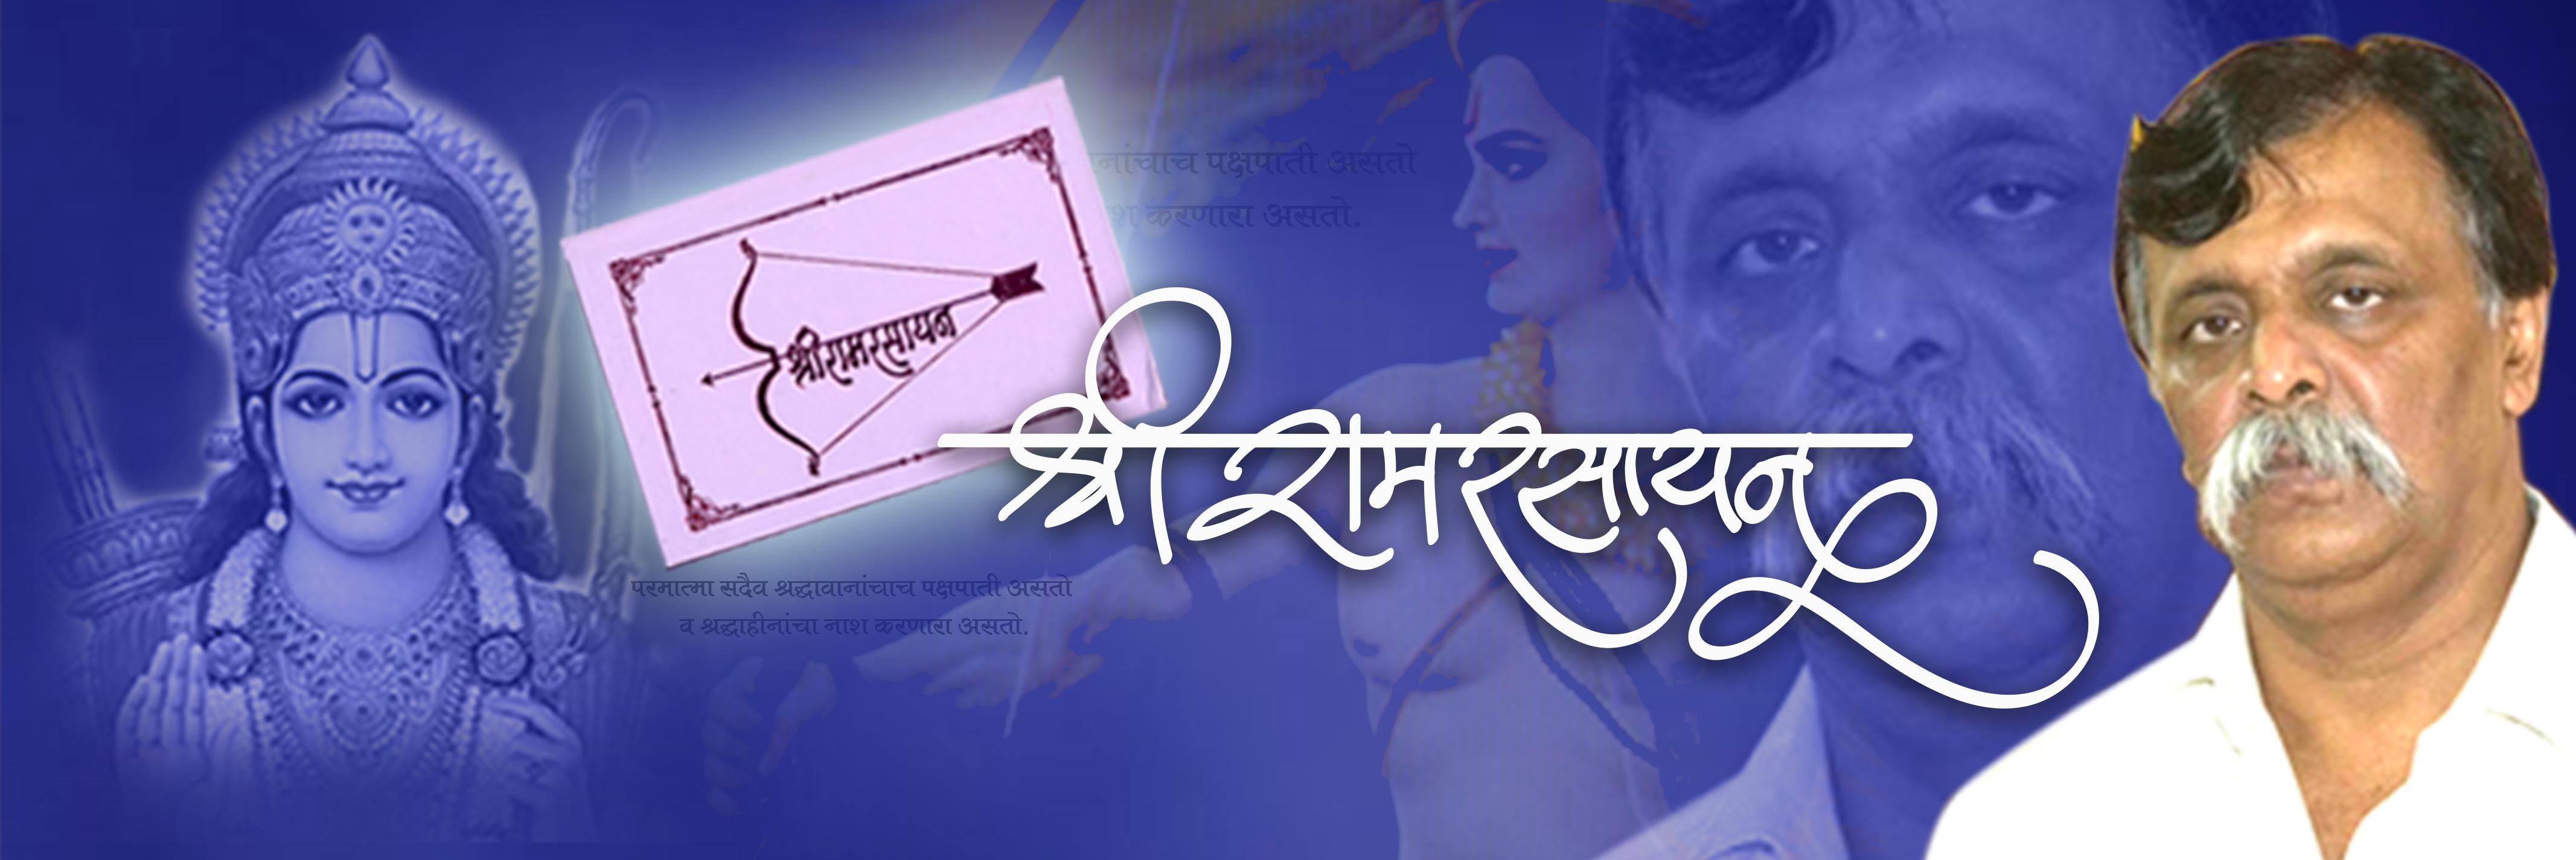 Aniruddha Foundation-Ramrasayan Grantha